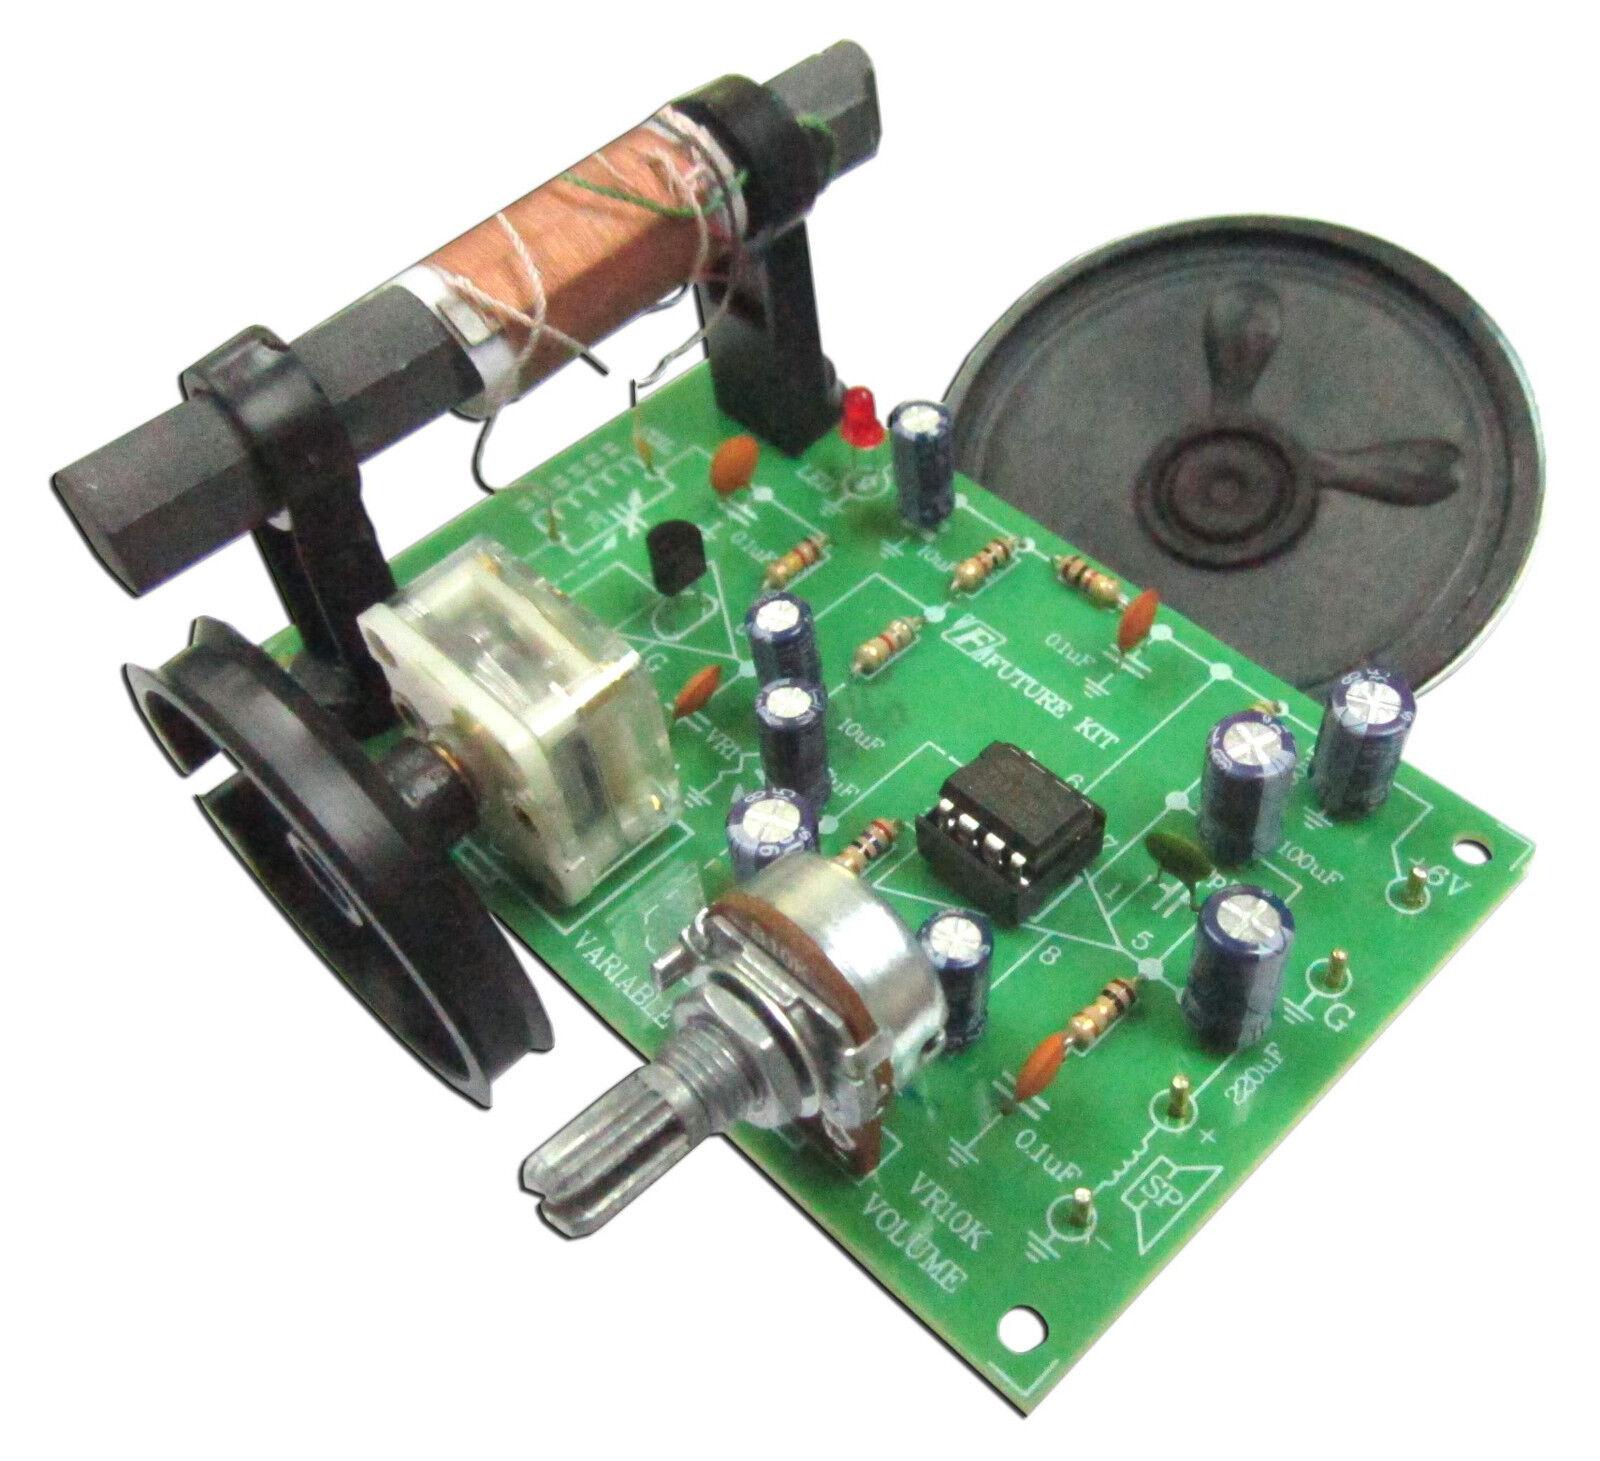 ✔️ Модель электрического и тестового оборудования AM Radio Experiment Circuit board Assembed kit 6VDC with free 2.5W speaker FA713 ? купить